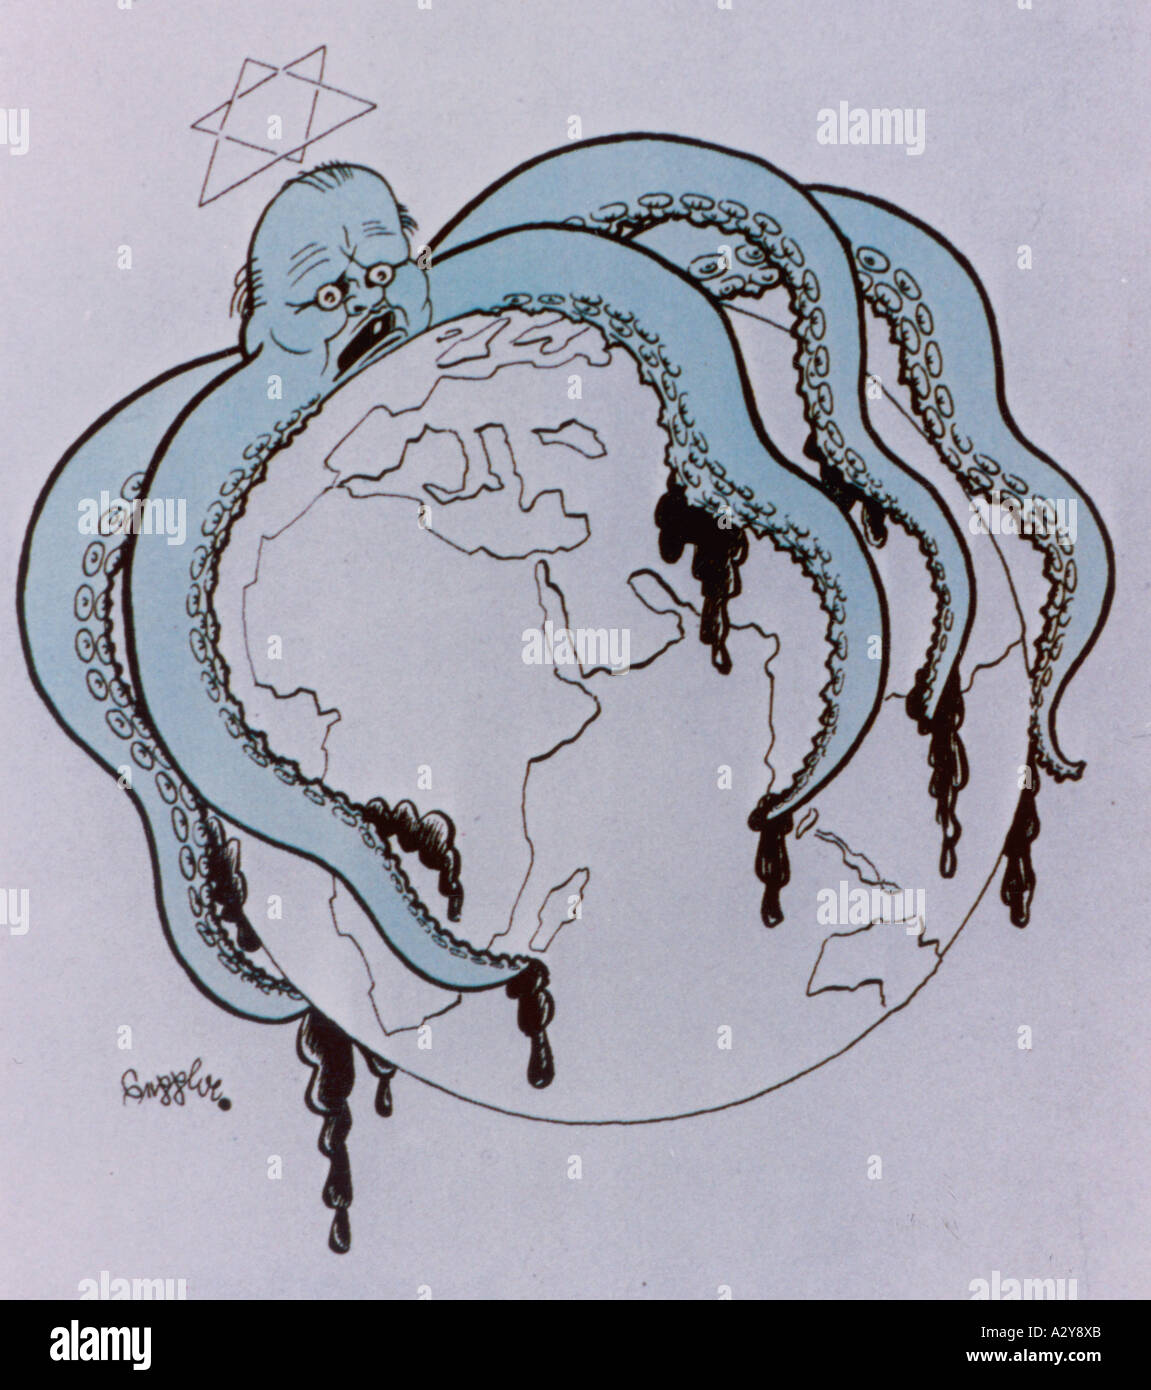 Ww2 Nazi Cartoon Octopus Stock Photo